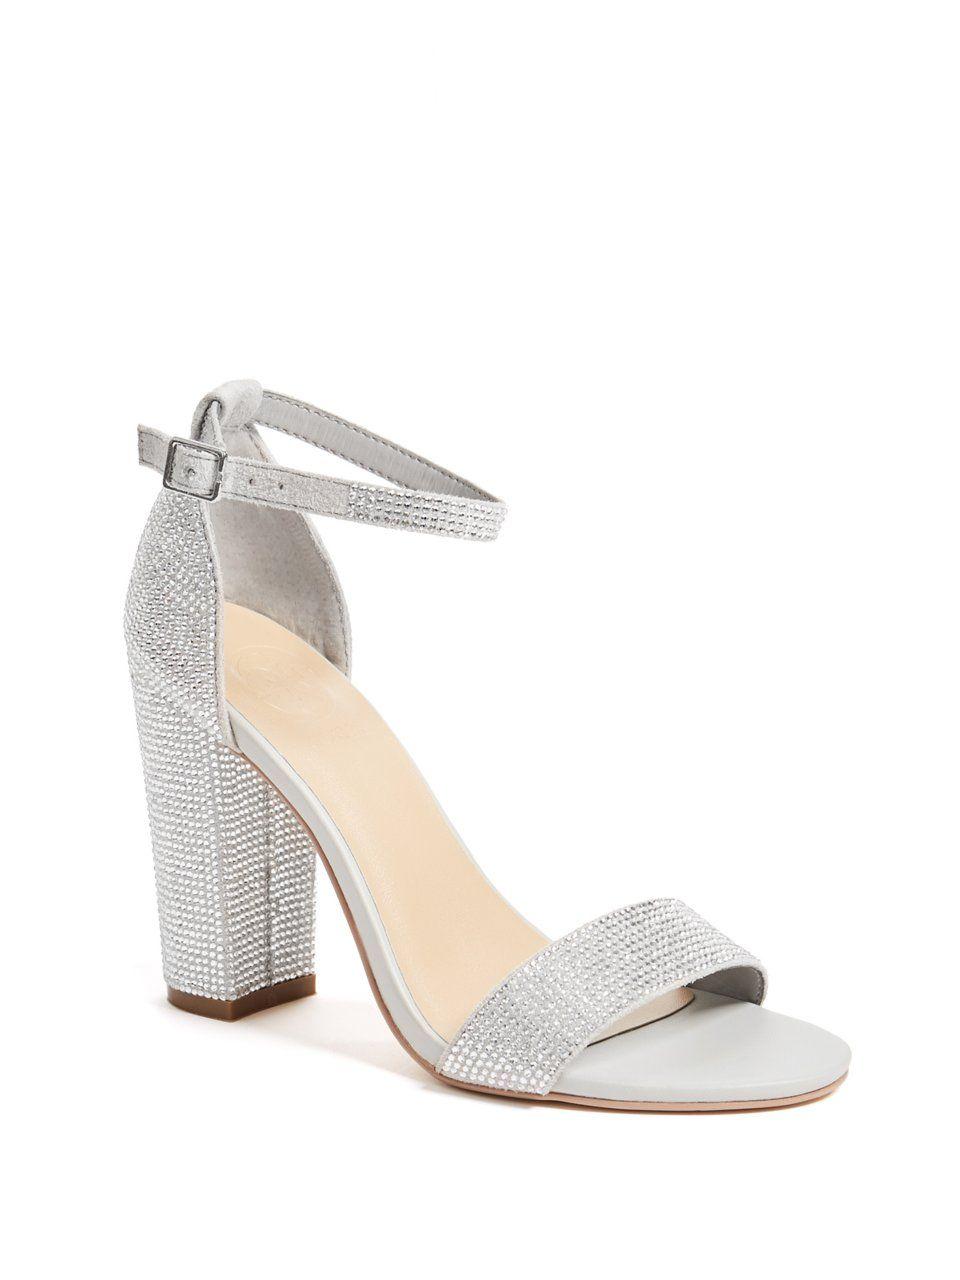 5fd30aab876a Disco Rhinestone Ankle-Strap Heels in 2019